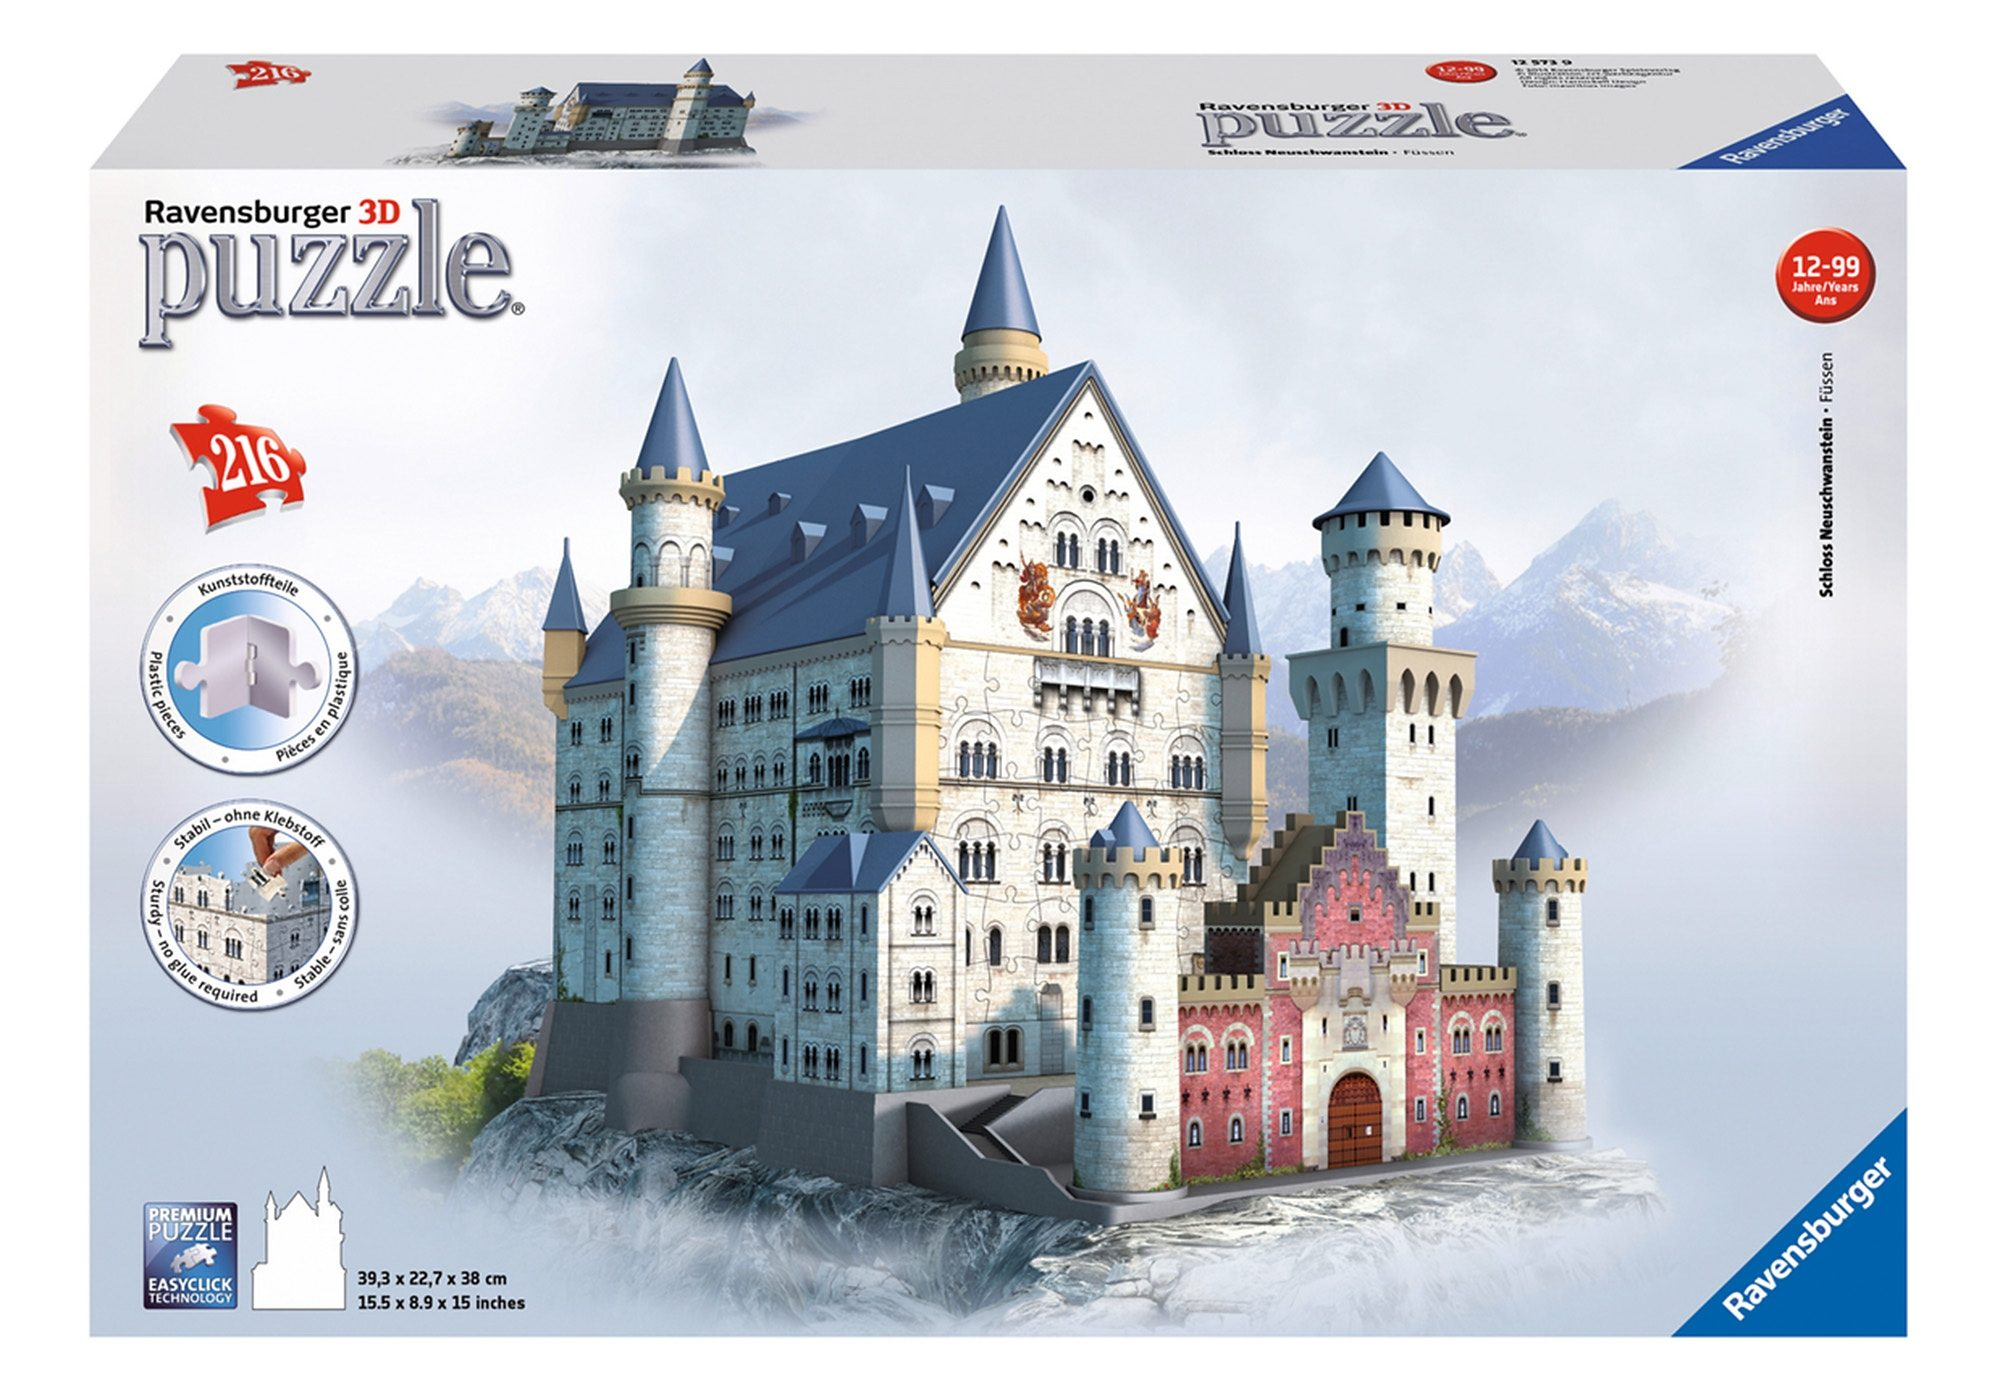 Ravensburger 3D Puzzle 216 Teile, »Schloss Neuschwanstein«